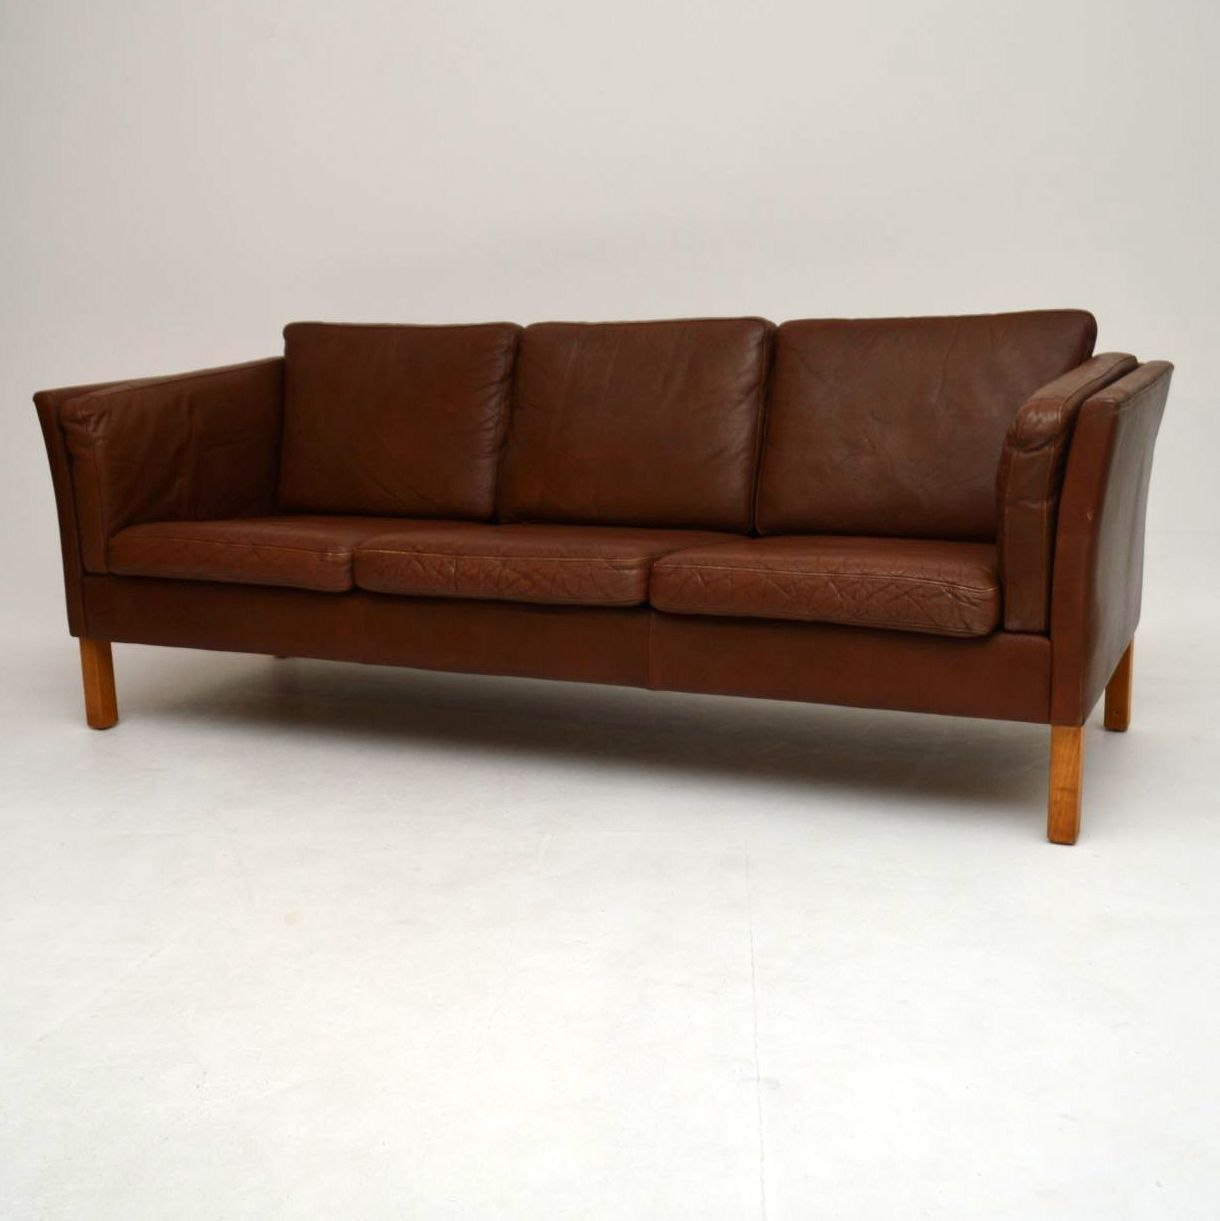 Danish Retro Leather Sofa Vintage 1960 S Retrospective